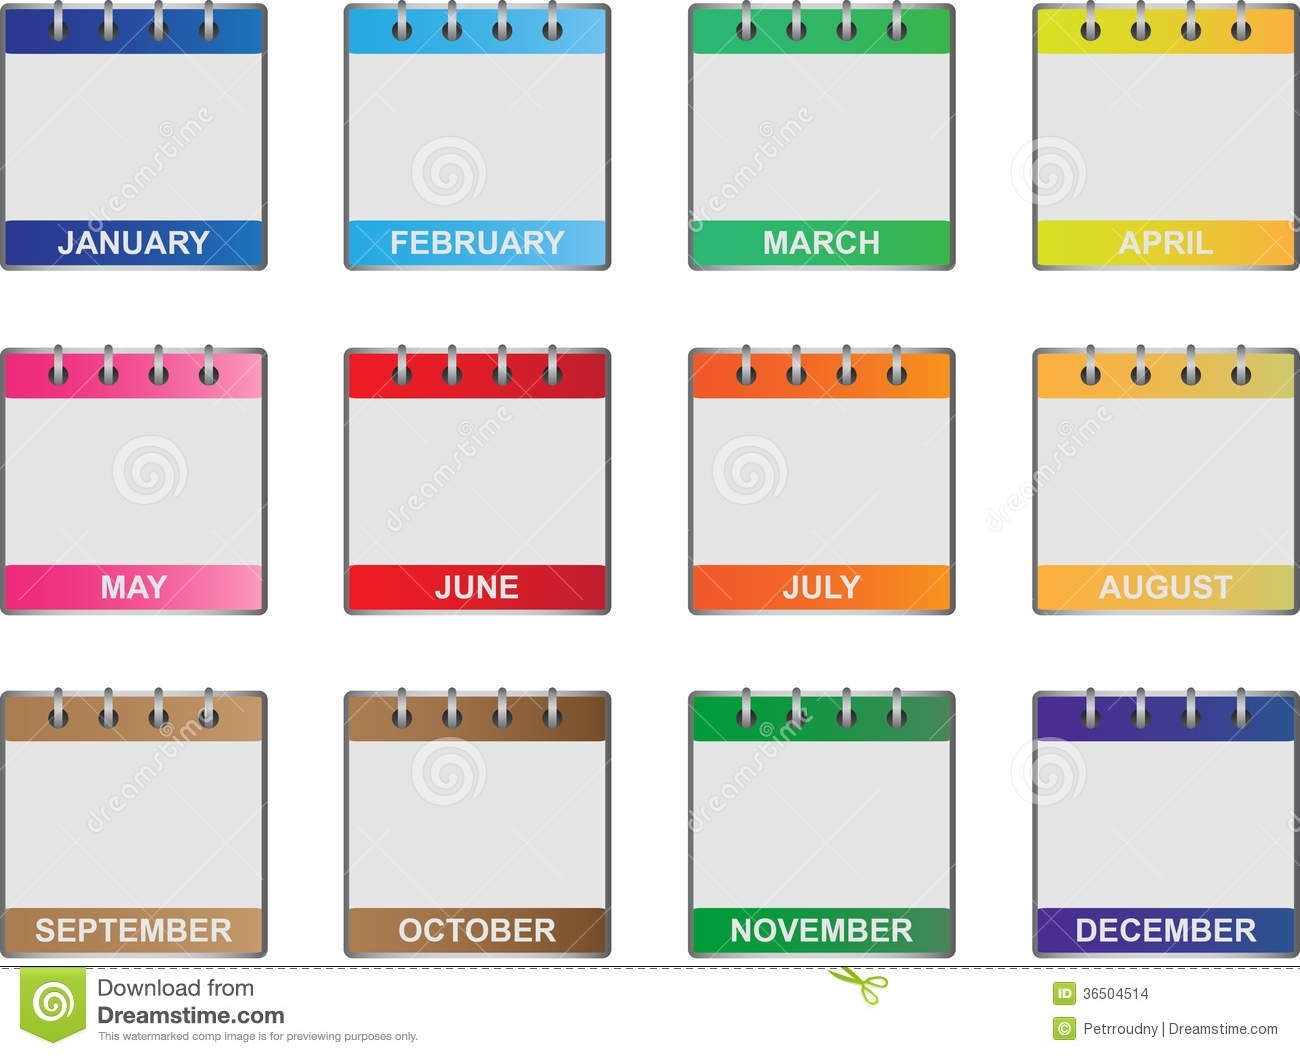 Calendar Icons Set Stock Vector. Illustration Of Illustrations regarding Calendar Months Of The Year